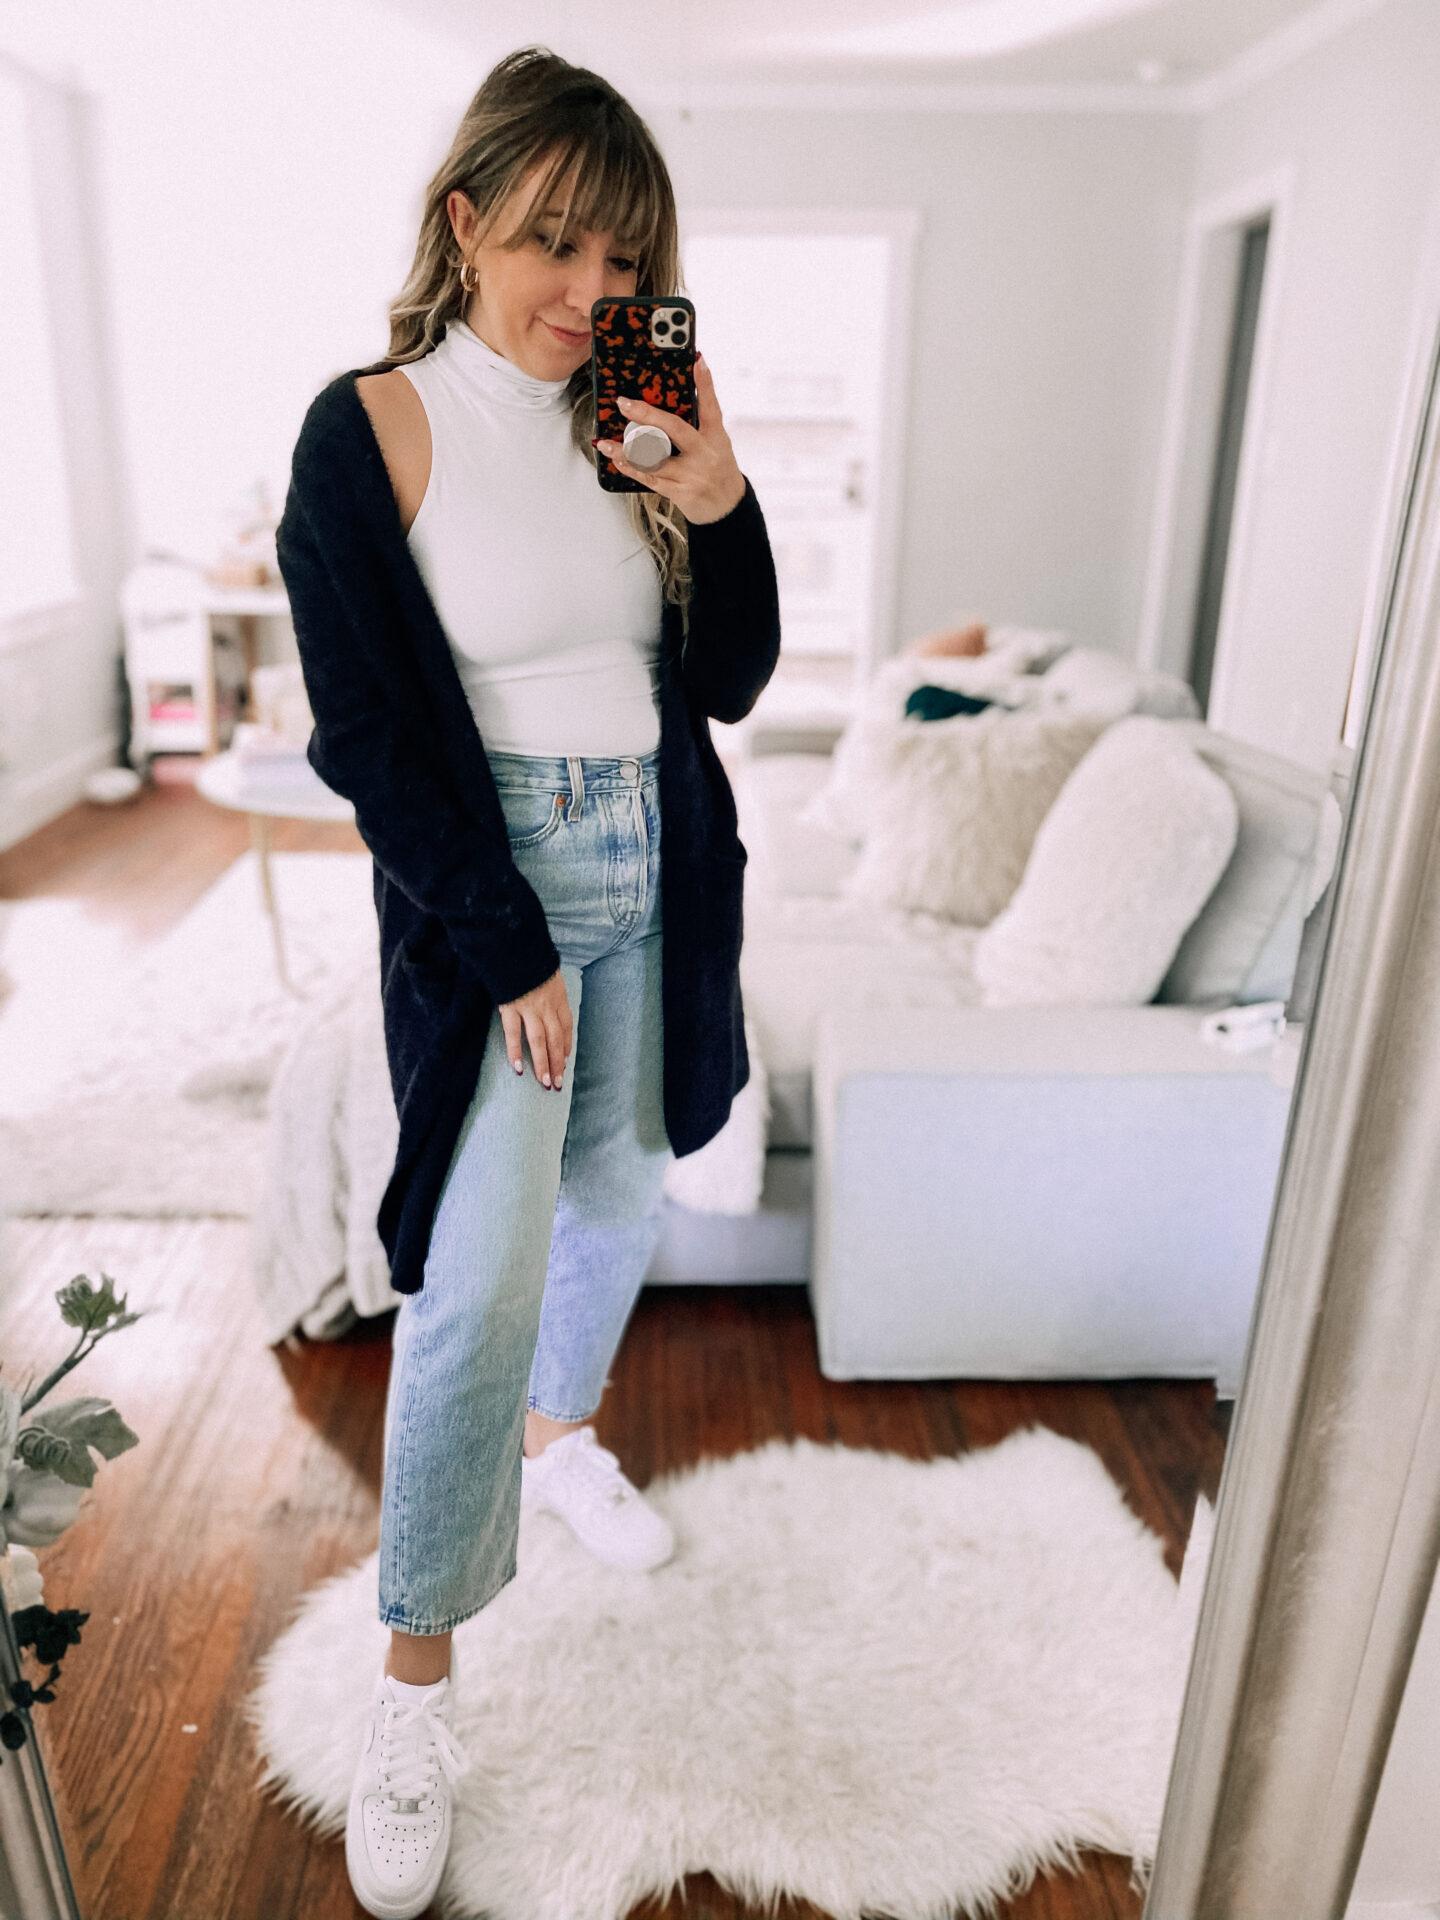 Turtleneck bodysuit and jeans